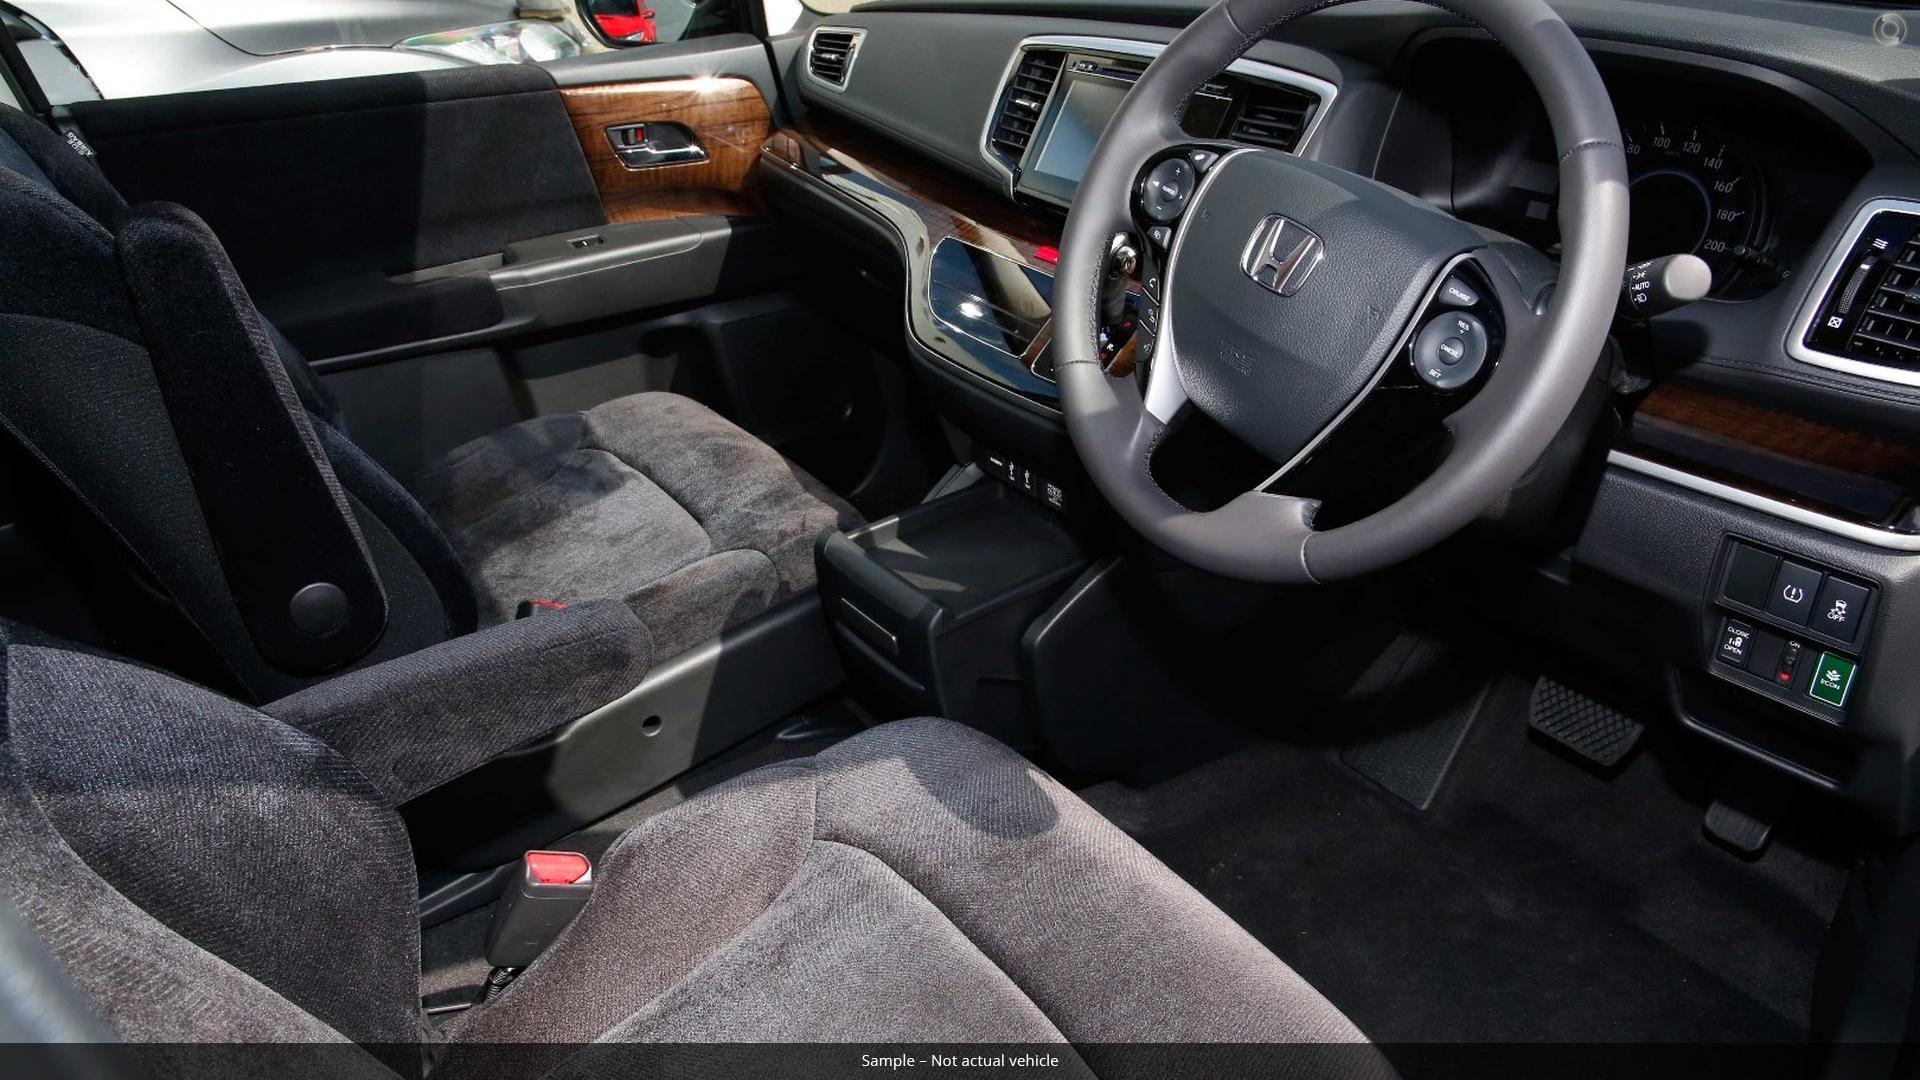 2019 Honda Odyssey 5th Gen